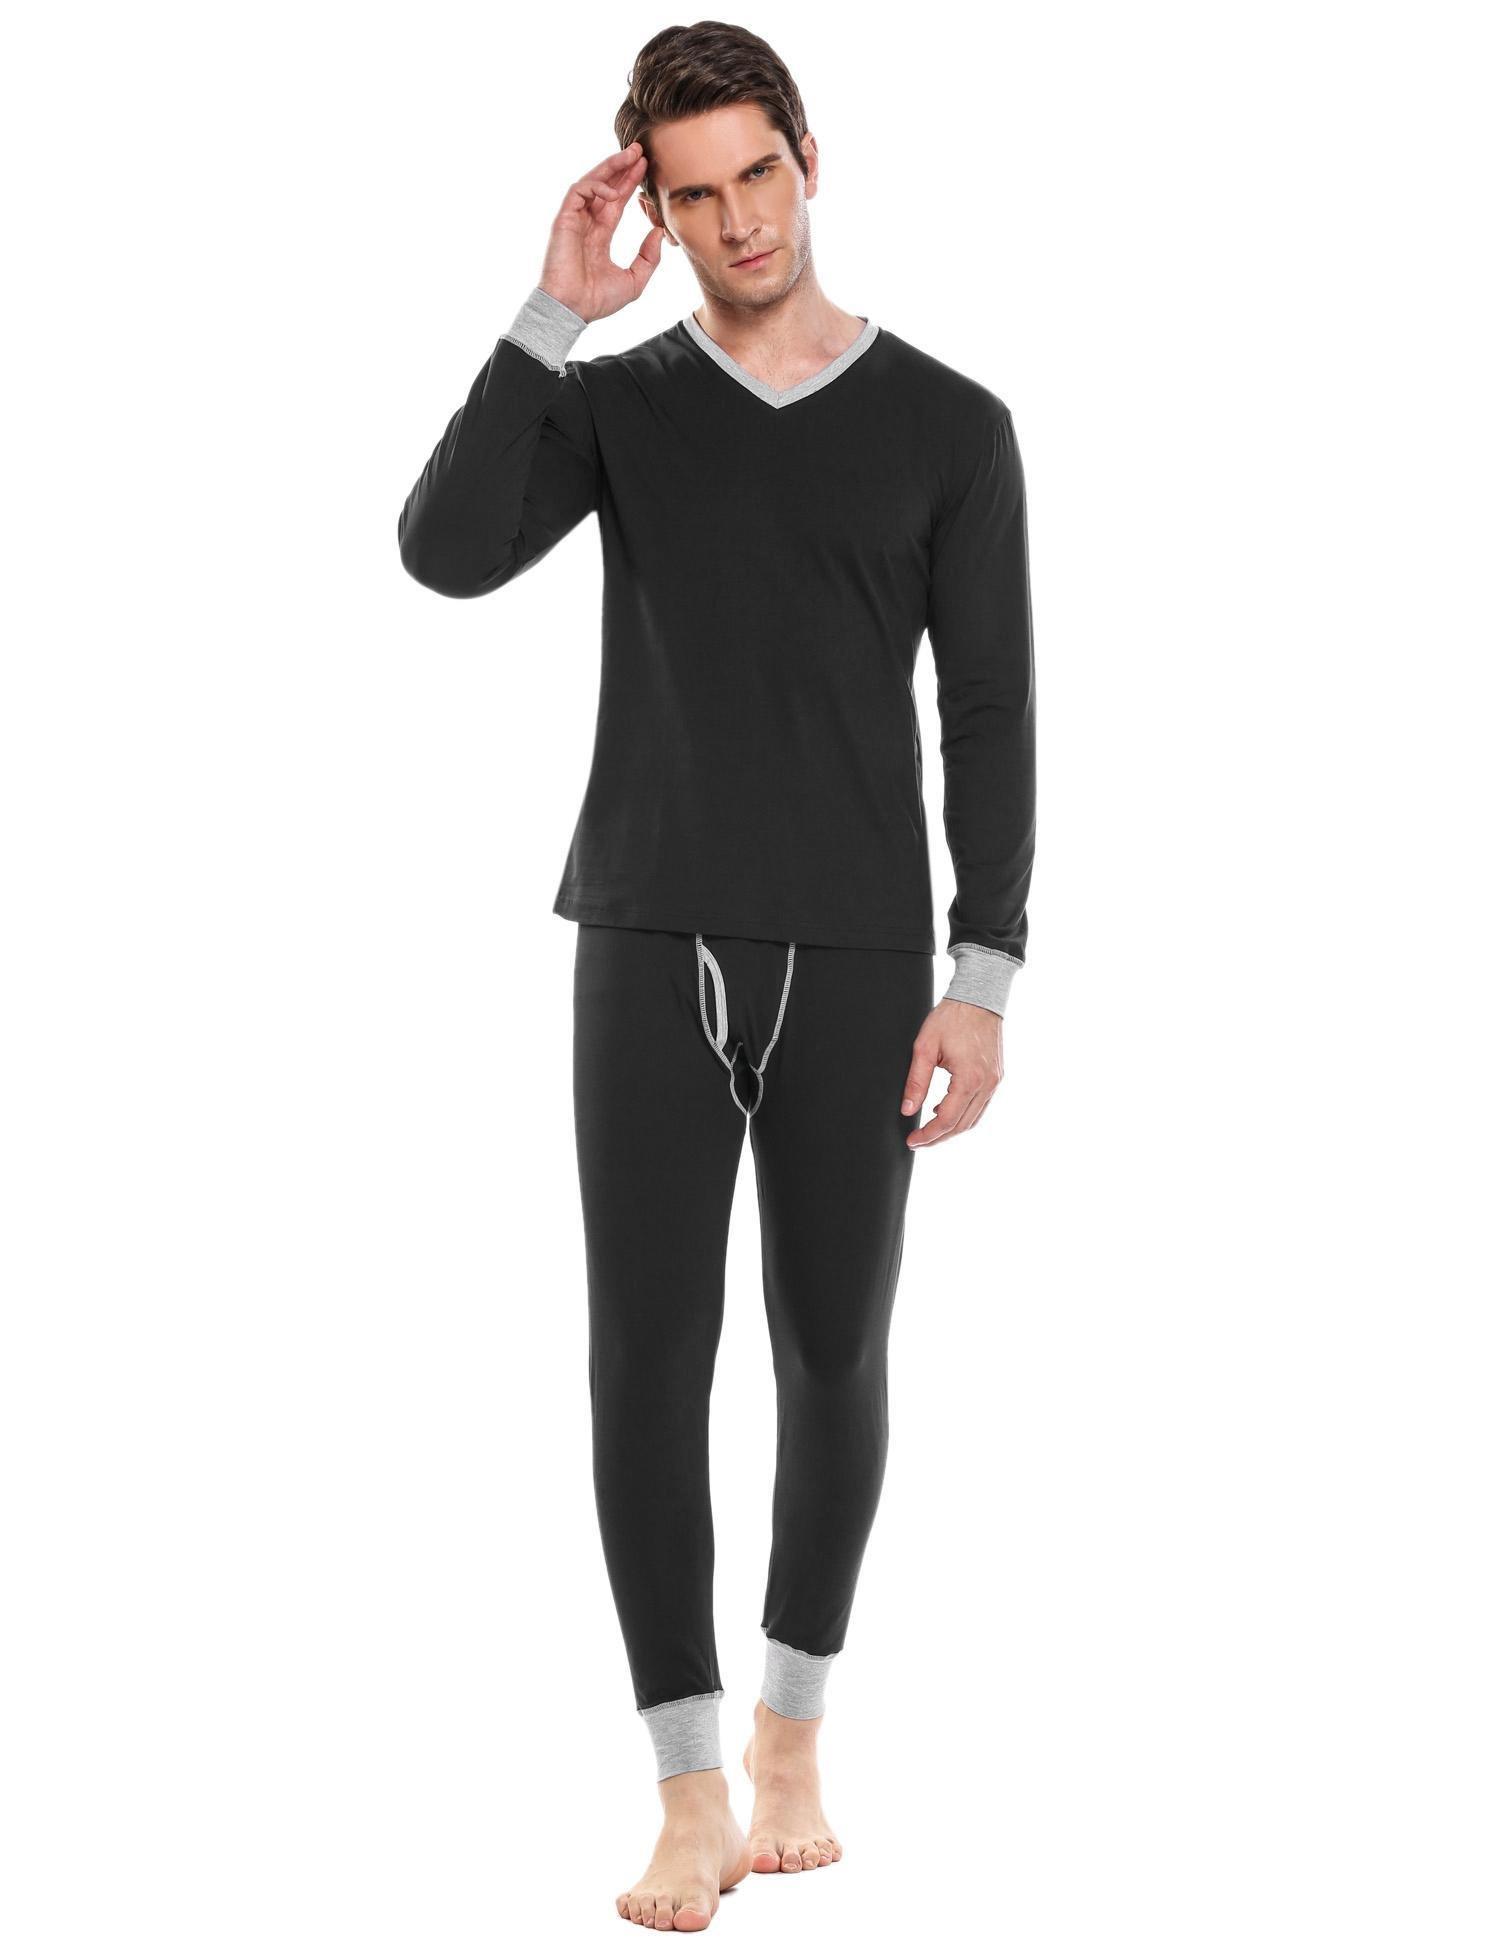 Langle Fashion Men's Soft Cotton Thermal Underwear Long Sets (Black, Large)